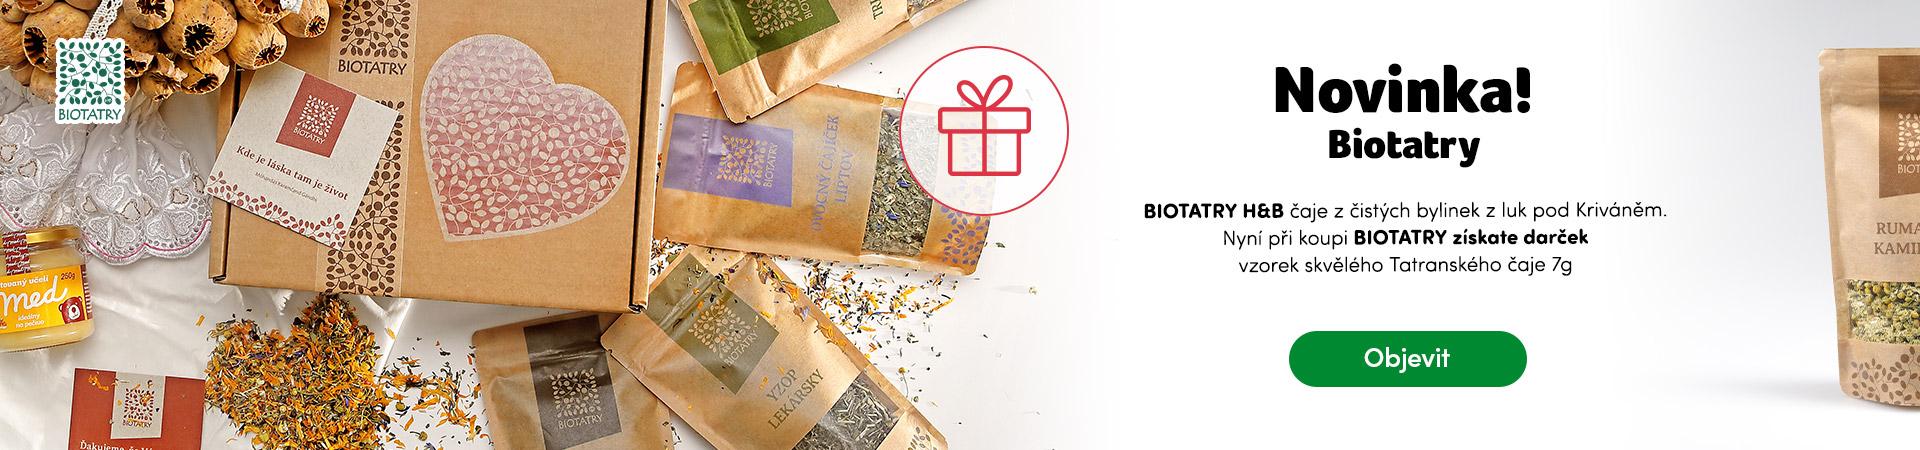 Novinka Biotatry plus dárek